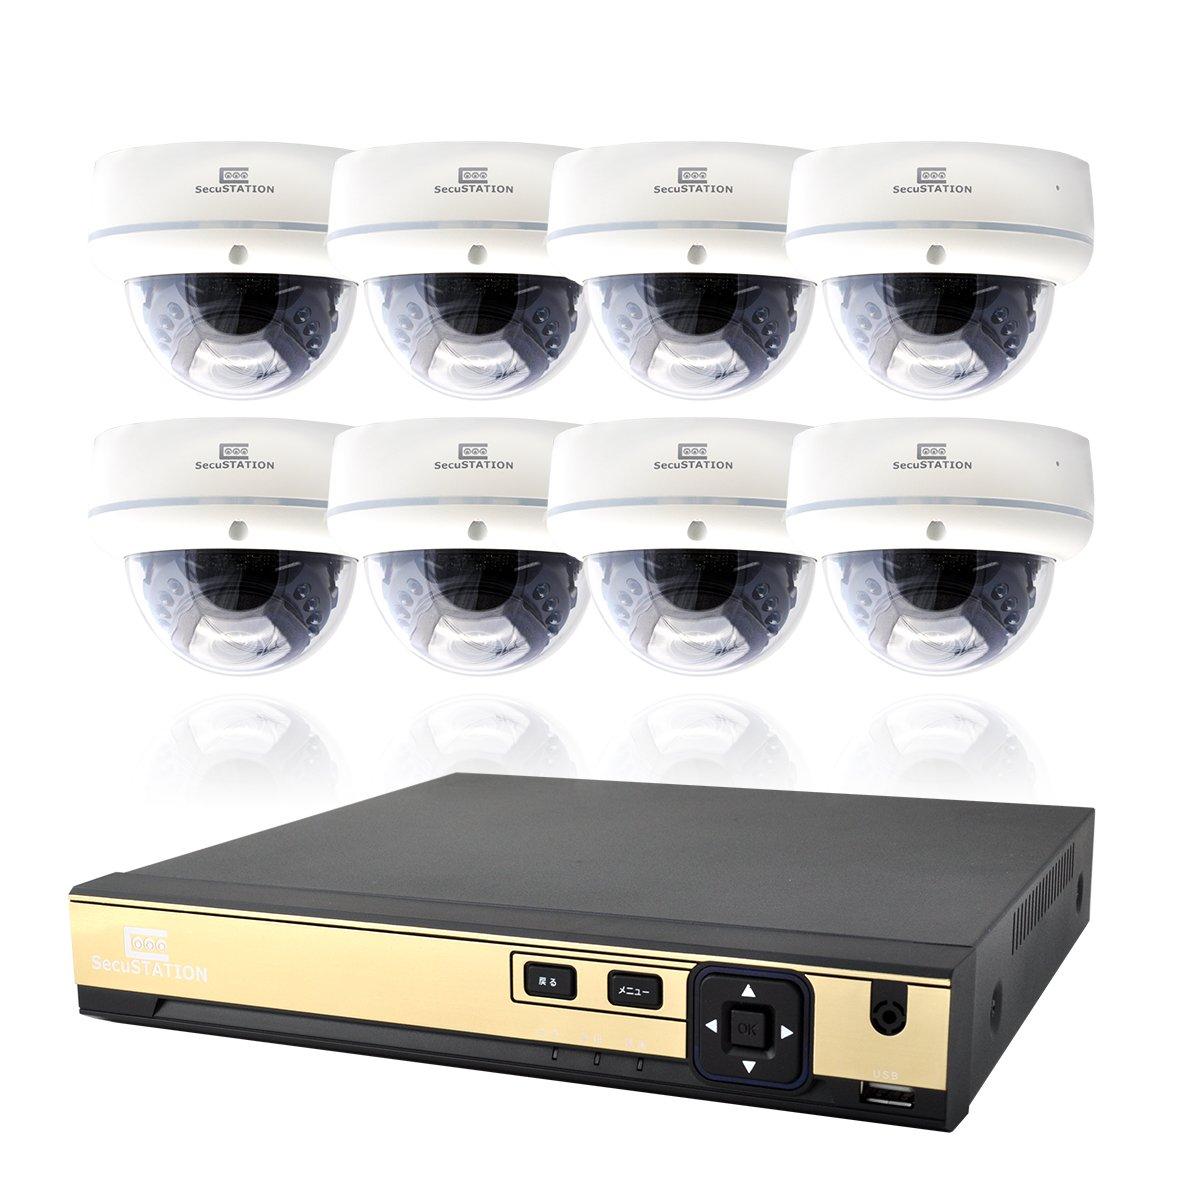 SecuSTATION ドーム型 AHD録画装置 ドーム型 AHD録画装置 防犯カメラ8台セット HDDなし SC-XA82K 内蔵HDDなし SC-XA82K ホワイト B07JW8DYK8, タシロマチ:db505a35 --- loveszsator.hu